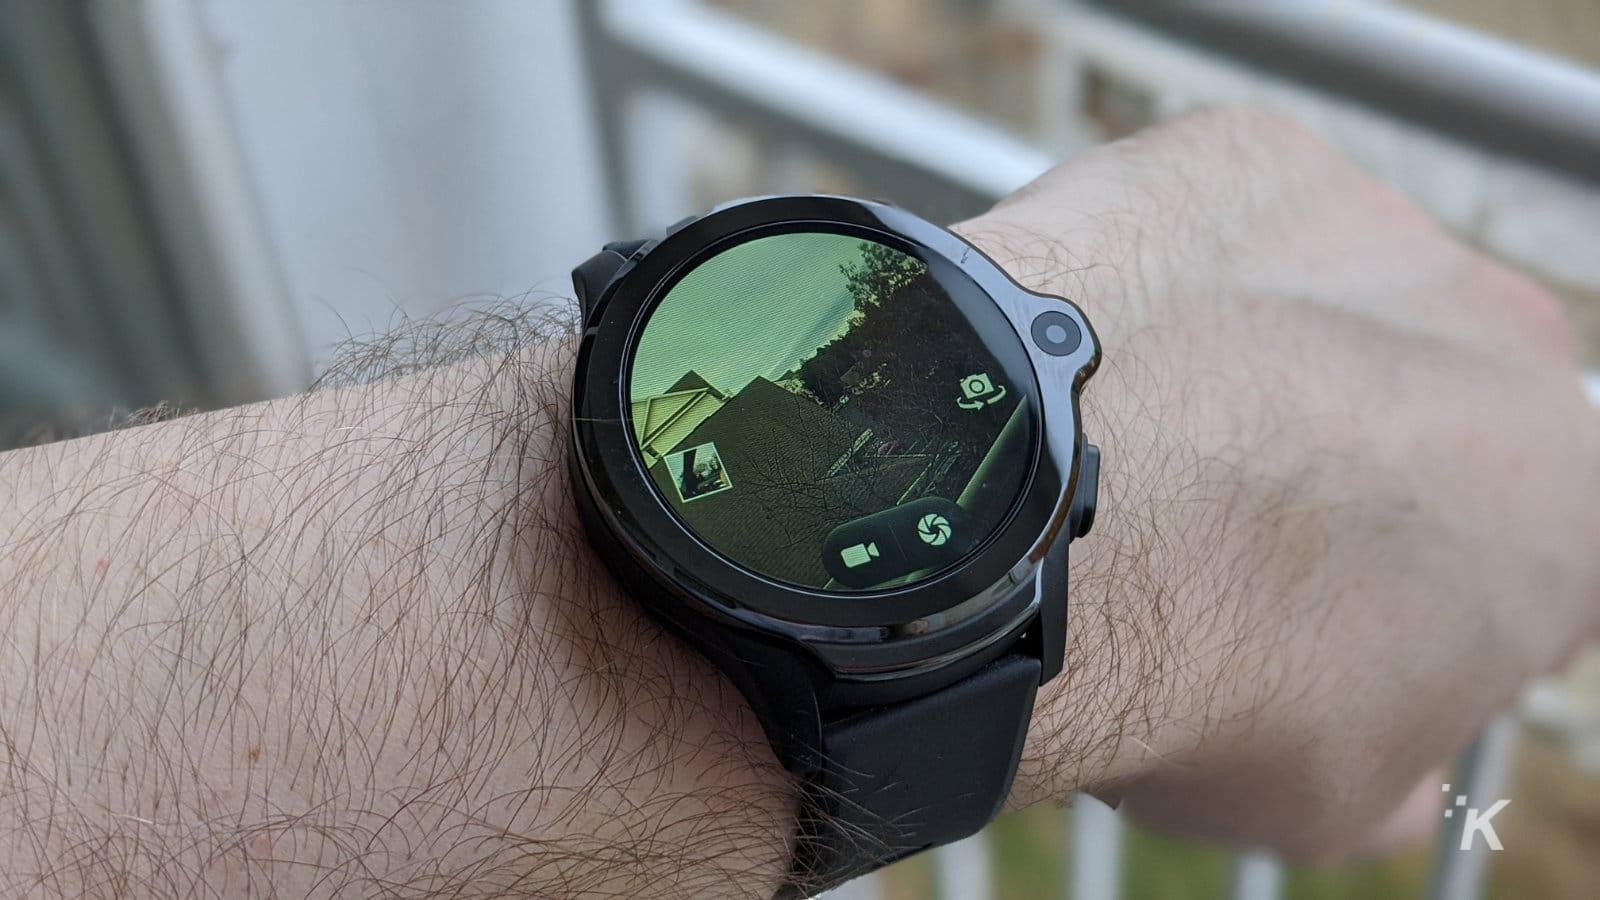 kospet smartwatch taking a photo